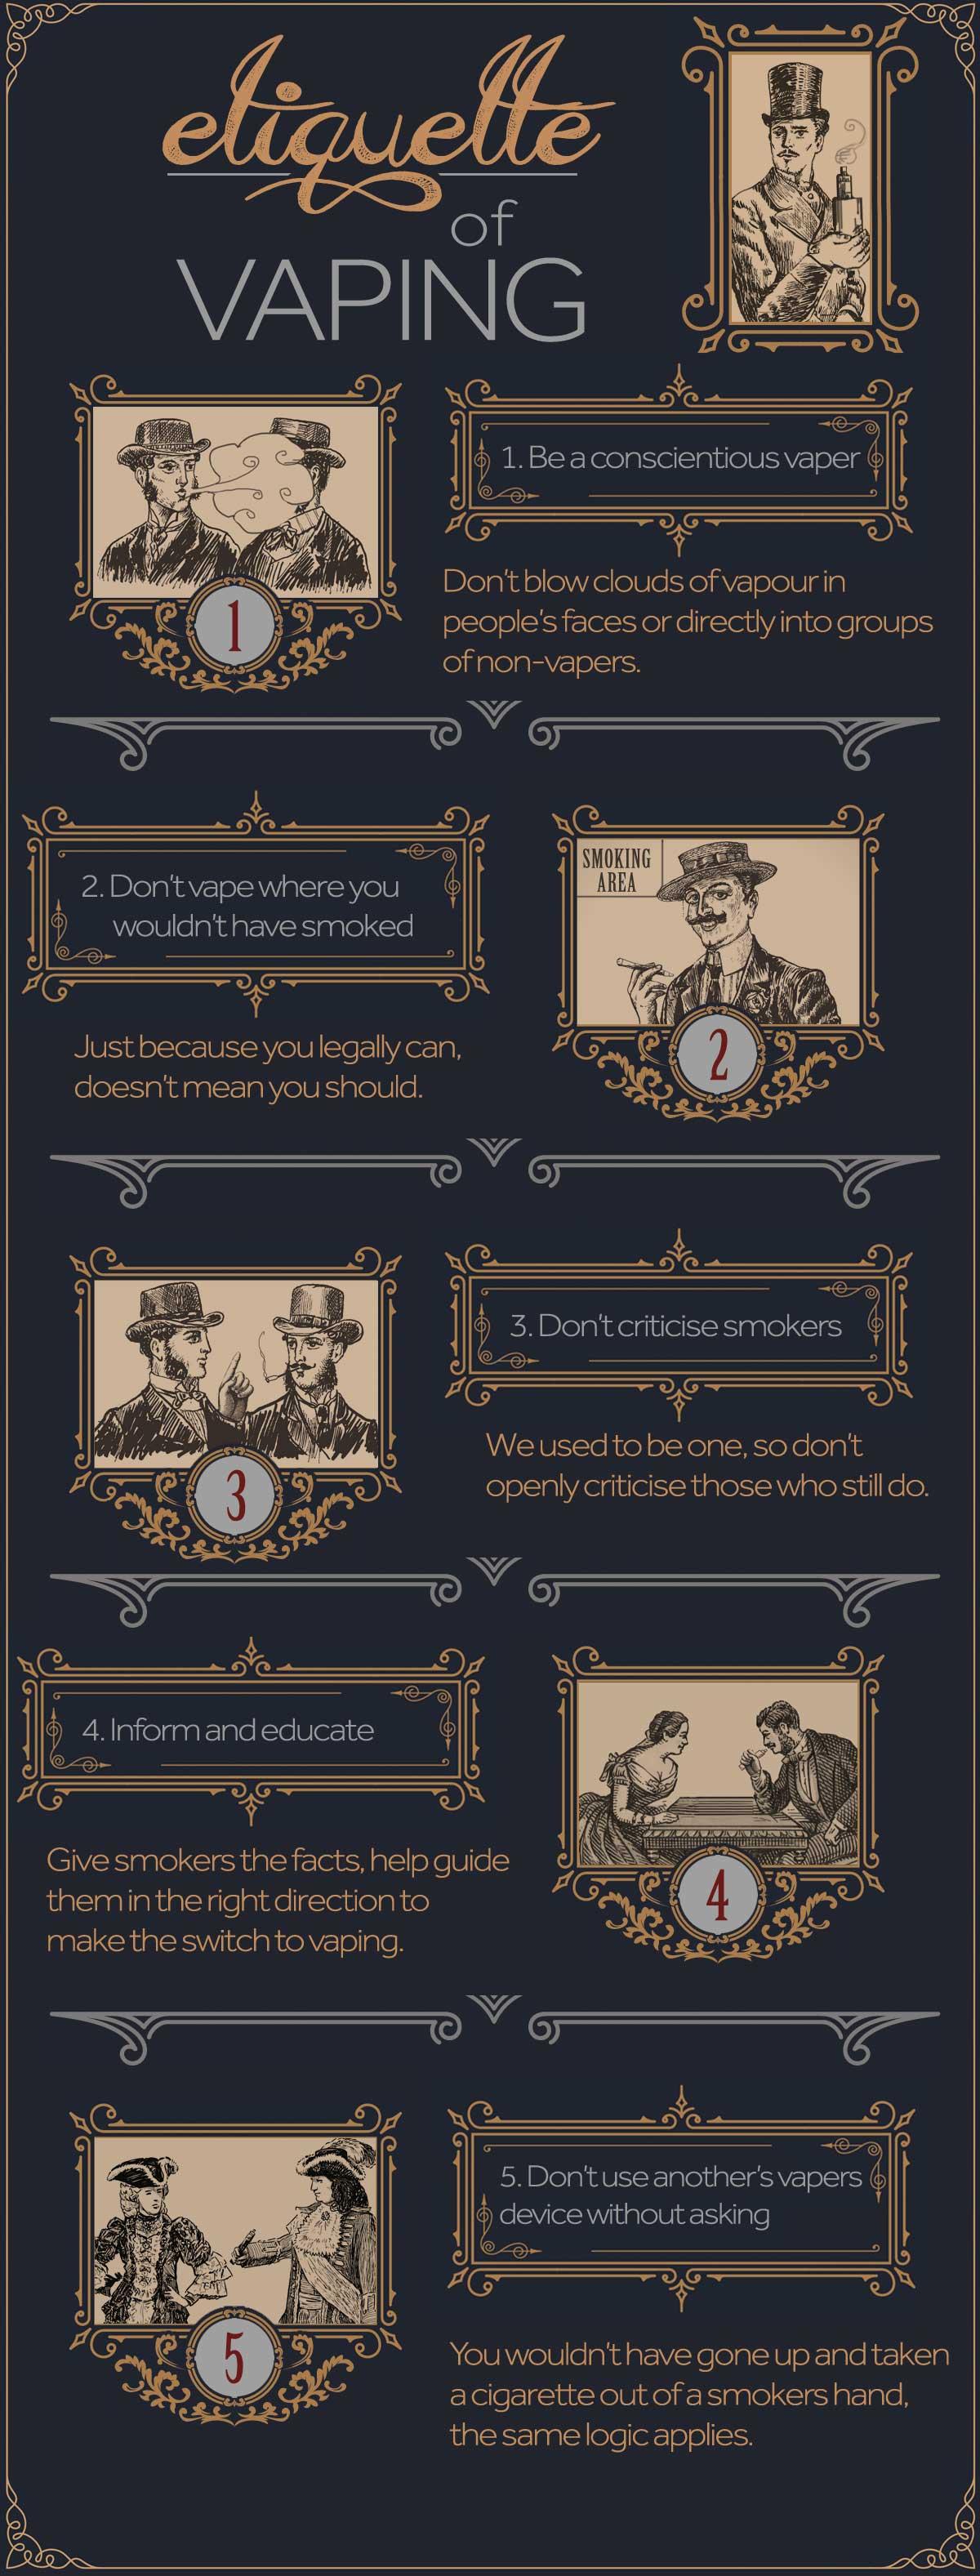 Vaping etiquette infographic